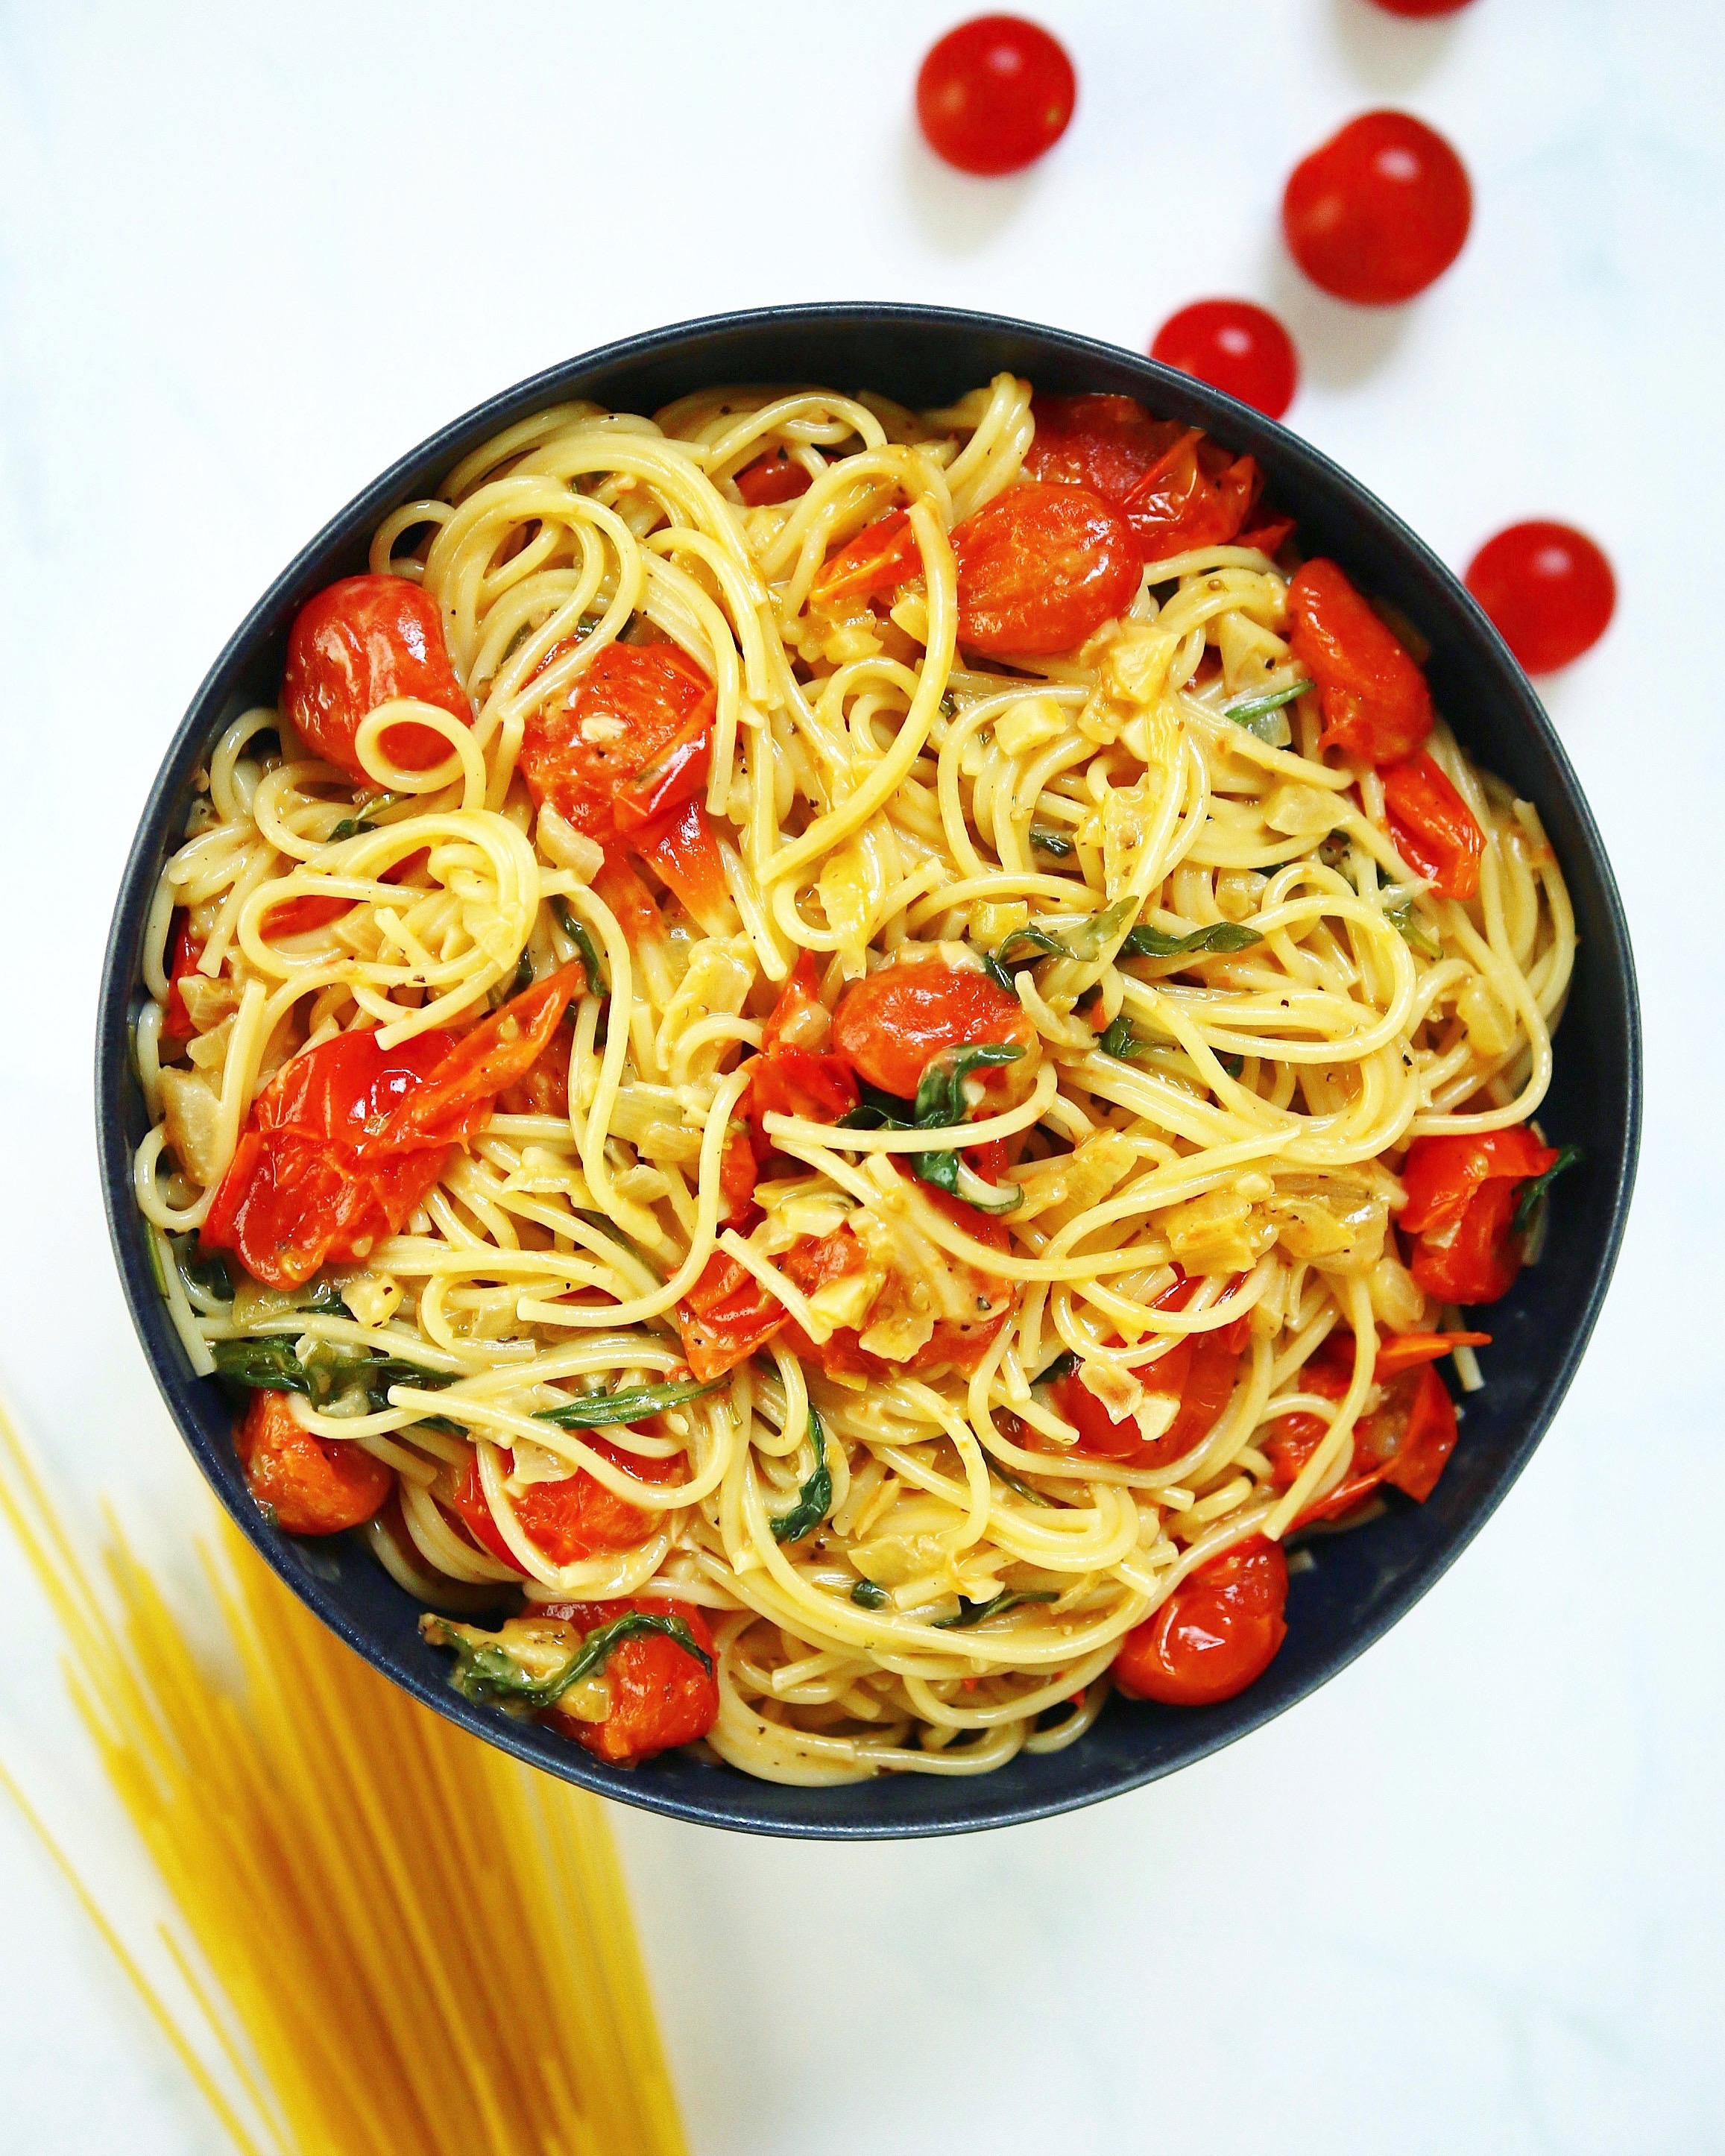 Spaghetti with Tomato & Garlic